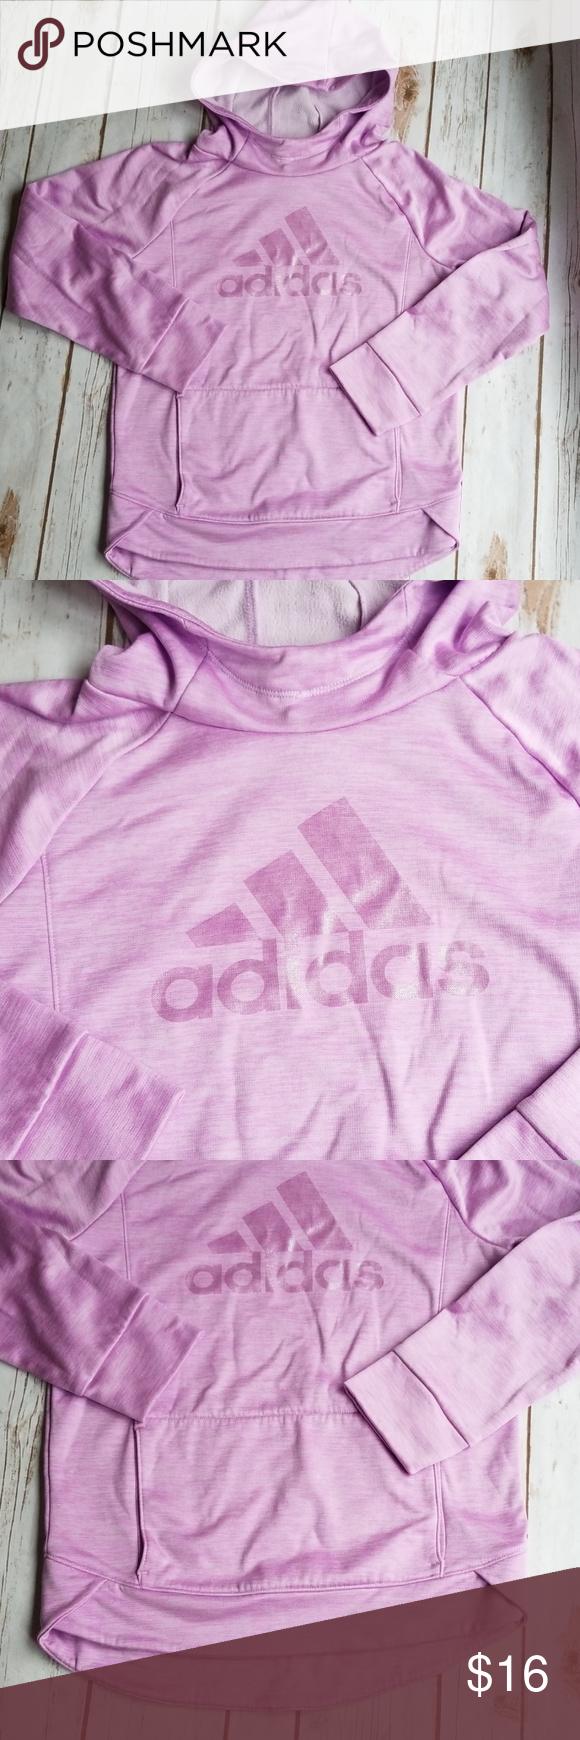 Girls Adidas Lavender Sweatshirt Sz 10 12 Euc Adidas Girl Adidas Sweatshirt Sweatshirts [ 1740 x 580 Pixel ]